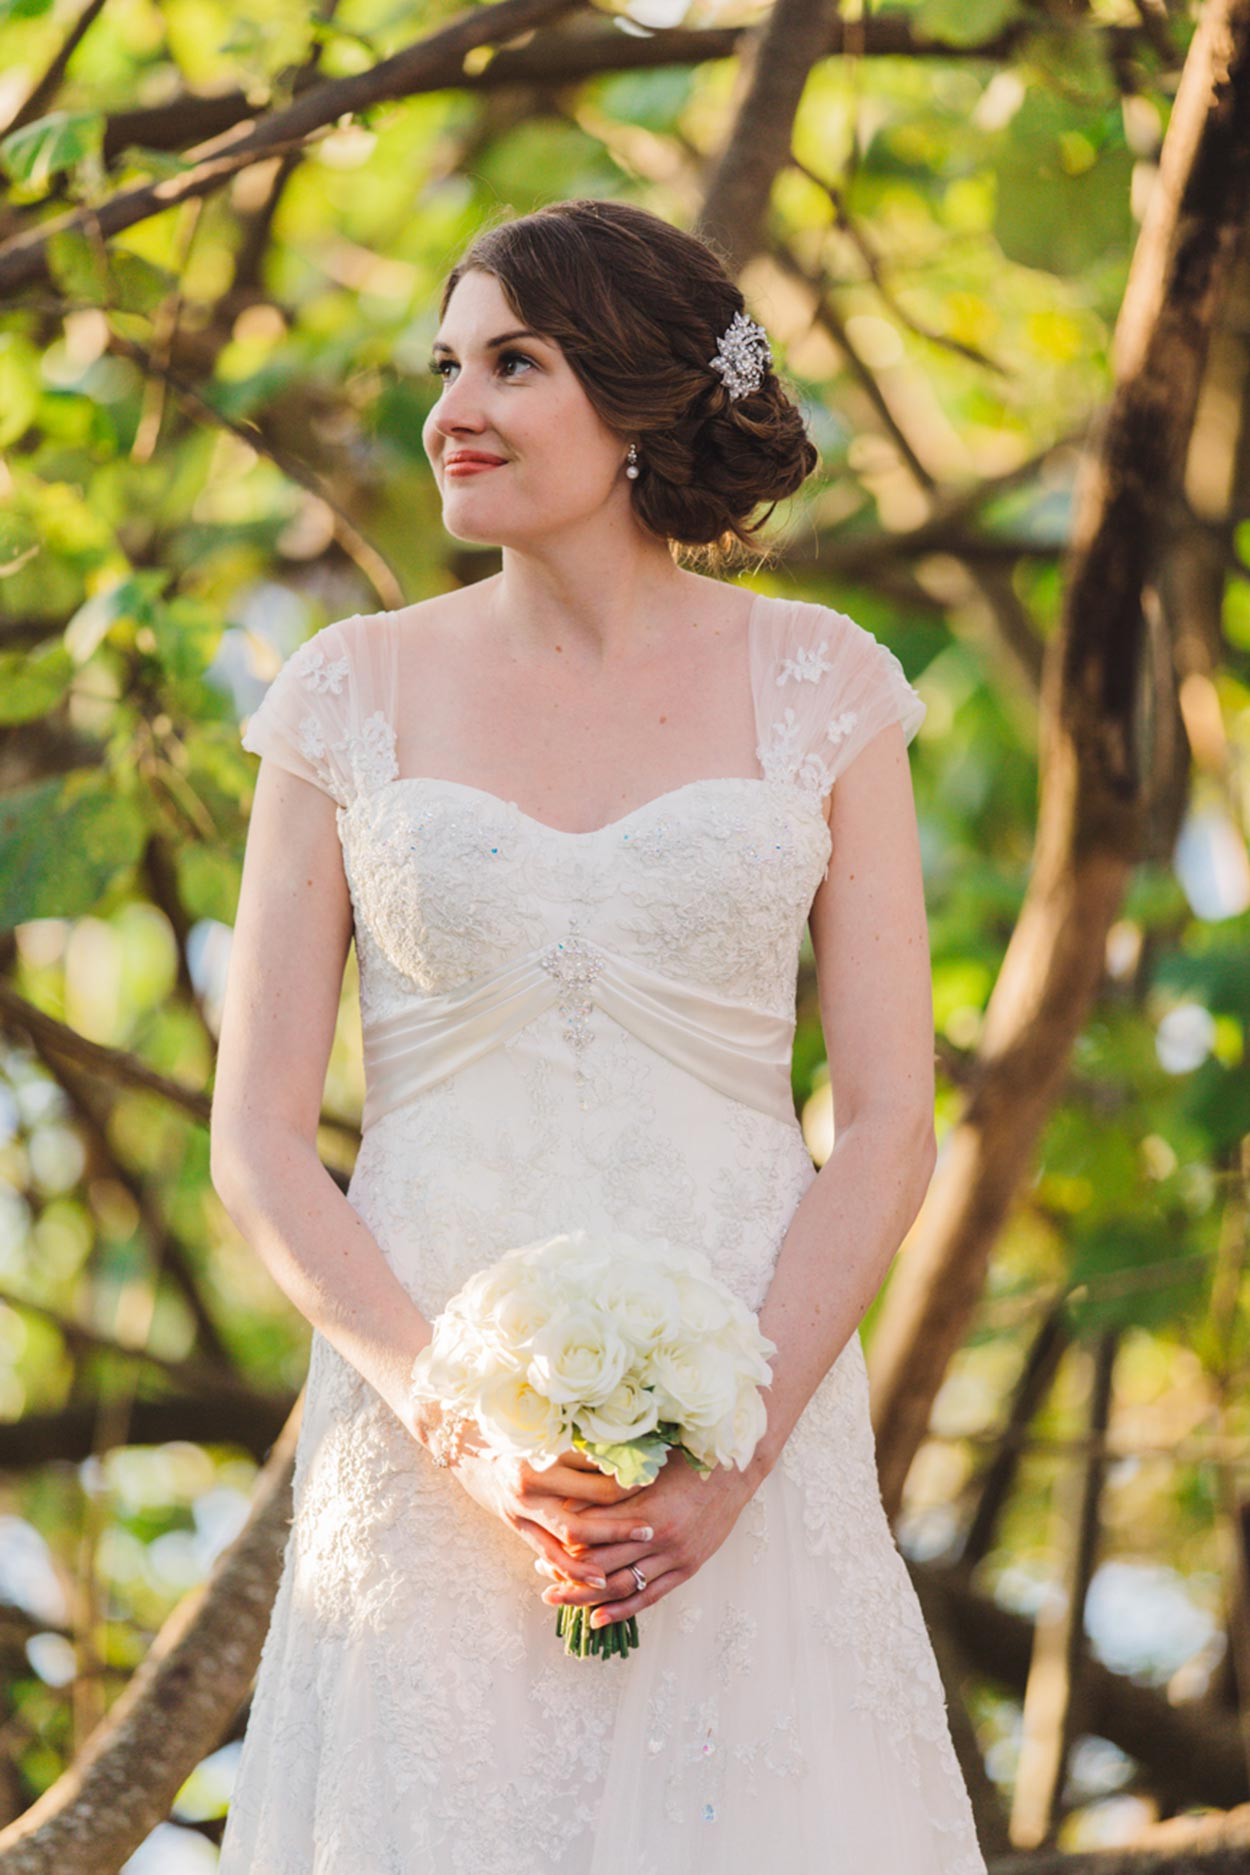 Sunshine-Coast-Wedding-Photographers-Eco-Friendly-Noosa-Maleny-Montville-Mapleton-Flaxton-Hinterland-Mooloolaba-Maroochydore-Caloundra-Coolum-Beach-Elopement-Brisbane-World-Best-Top-135.jpg